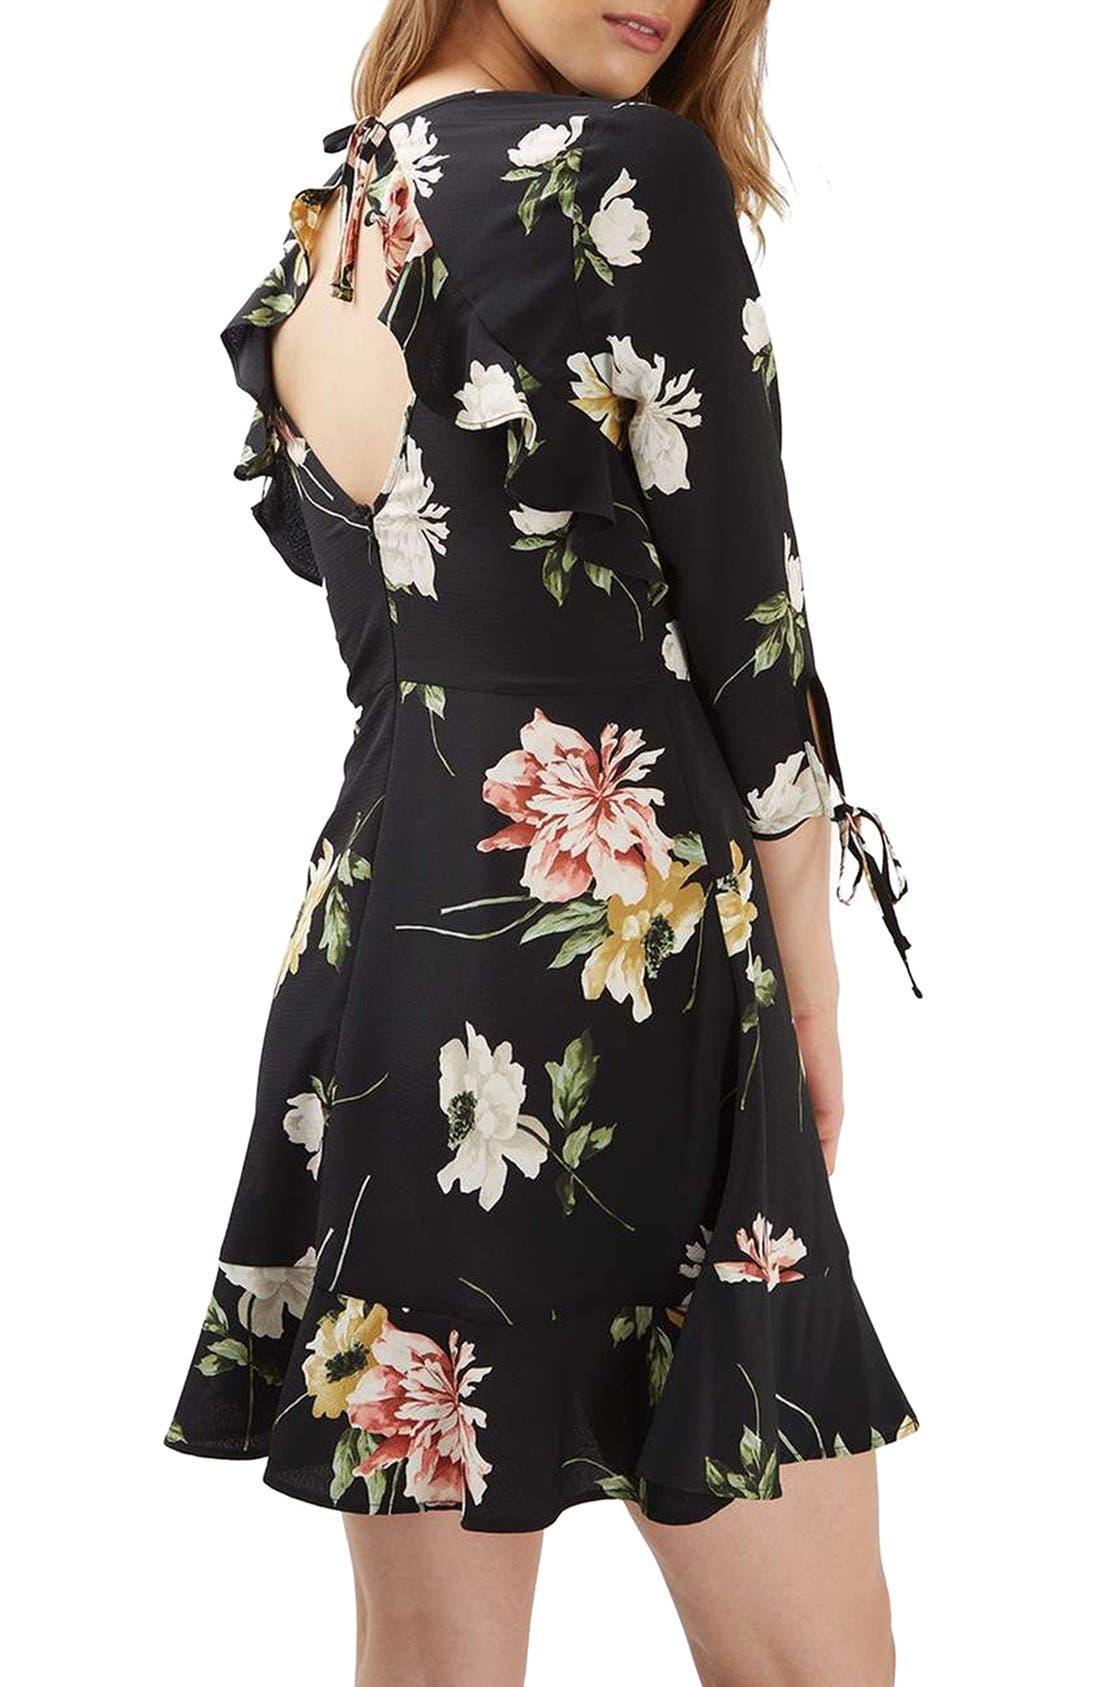 Ruffle Floral Tea Dress,                             Alternate thumbnail 3, color,                             001